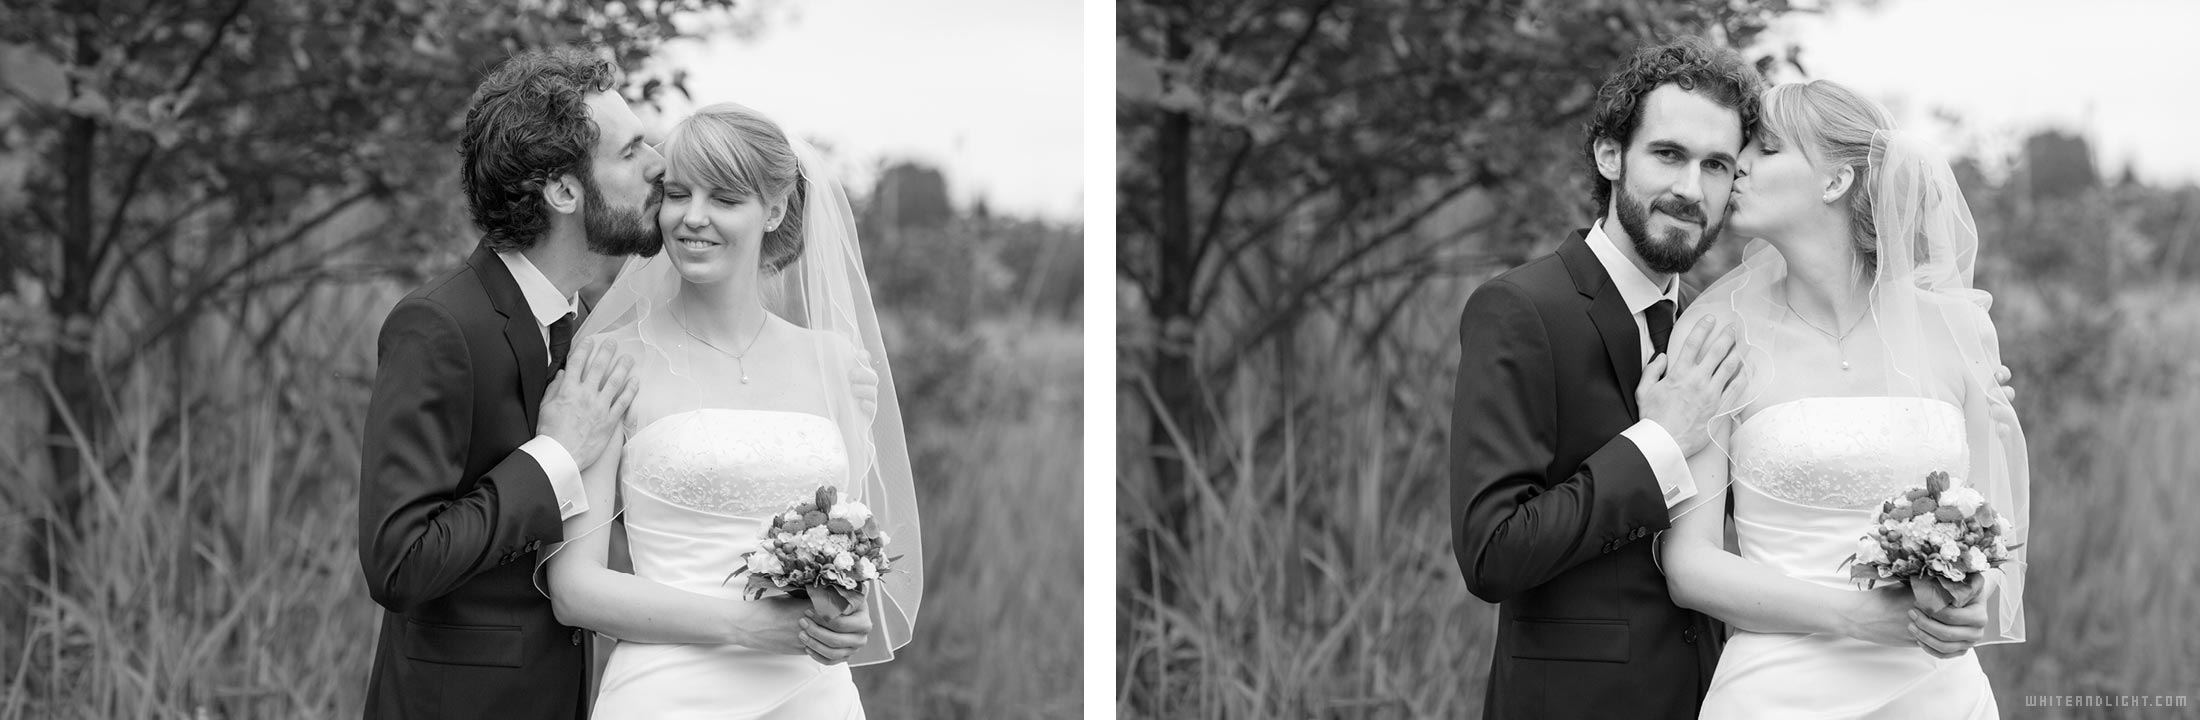 wedding photographer cost average